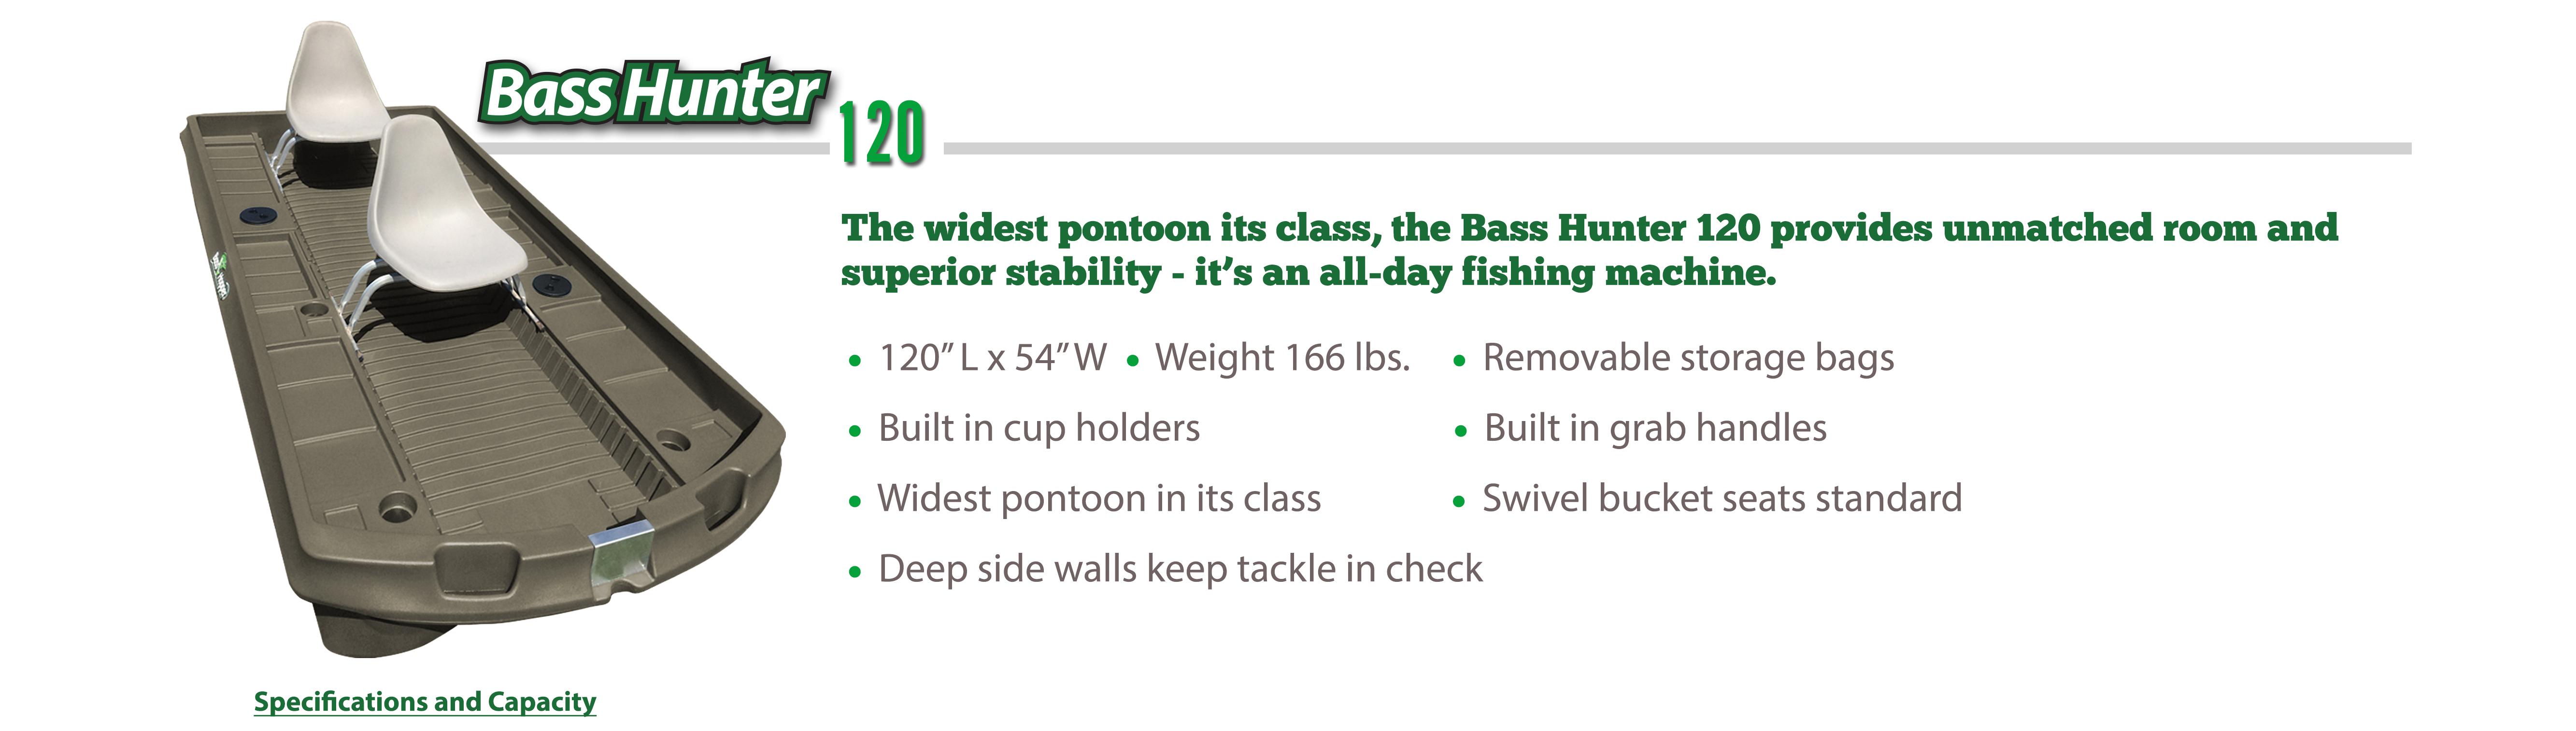 Bass Hunter 120